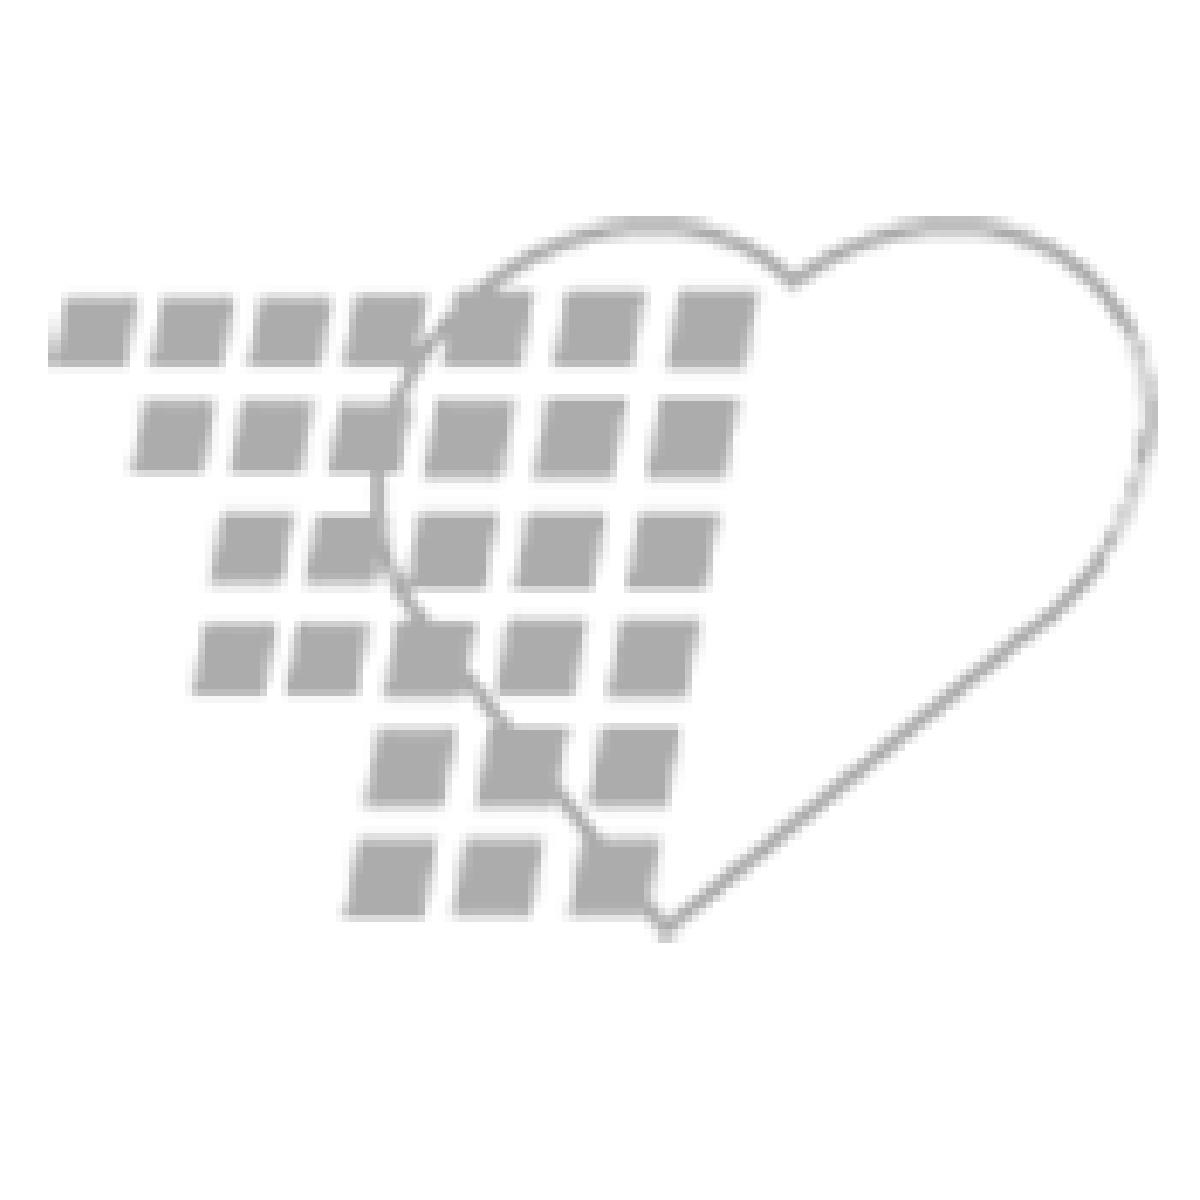 06-93-3117 Demo Dose® Meperidin 1 mL 100 mg/mL